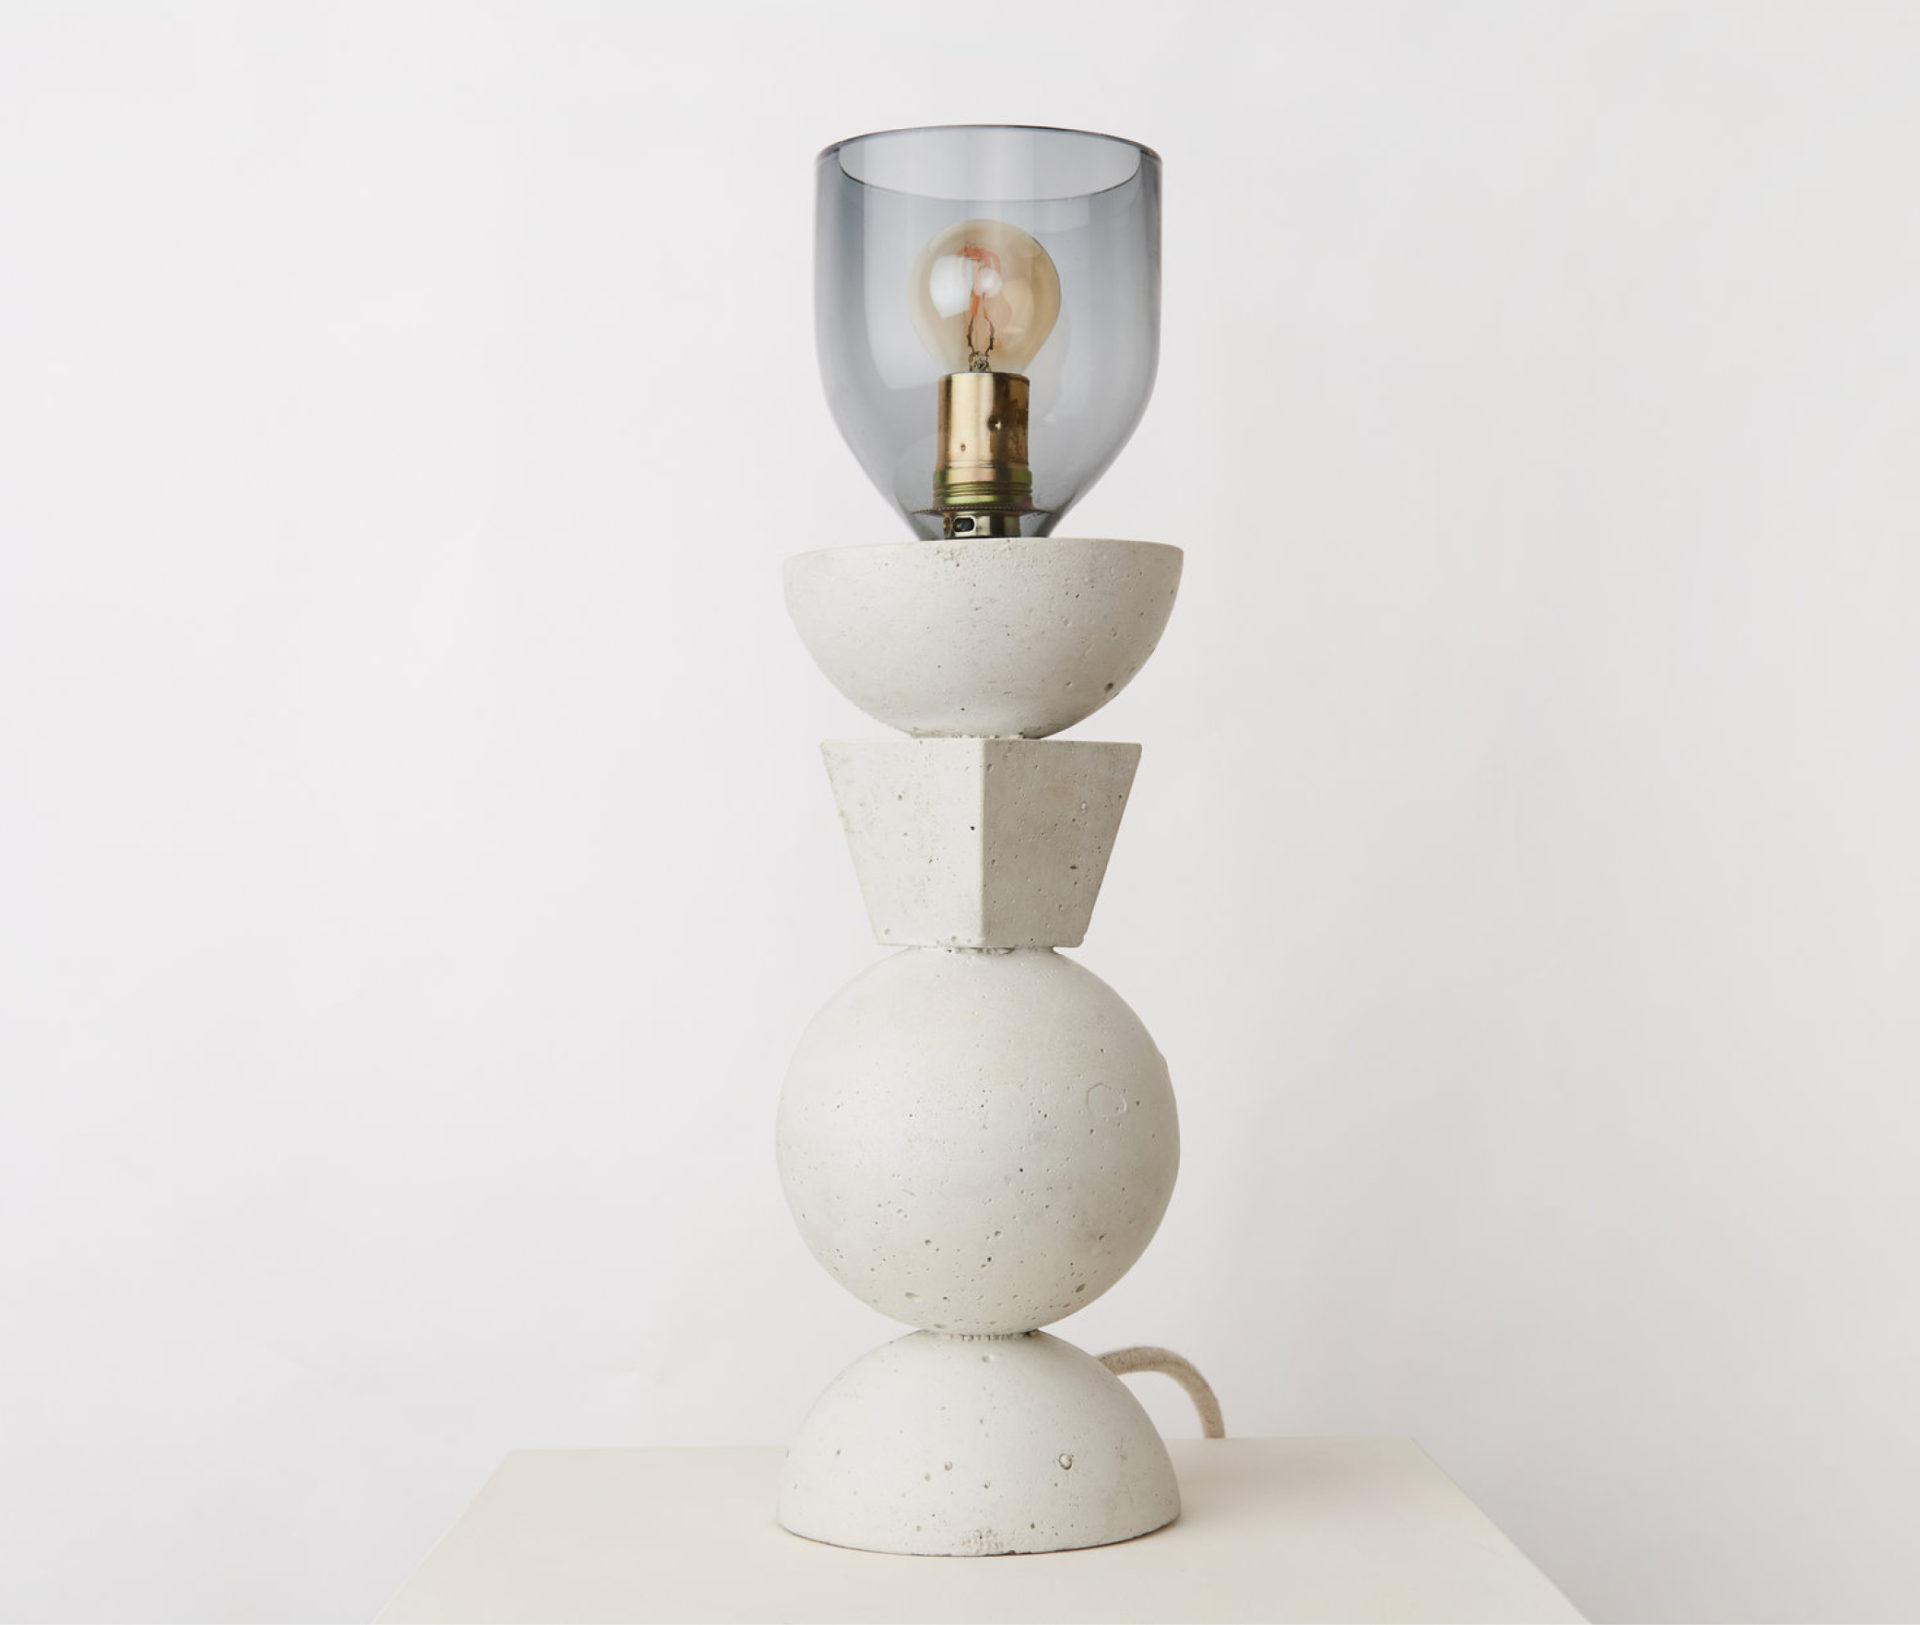 Lampe Concreto Totem